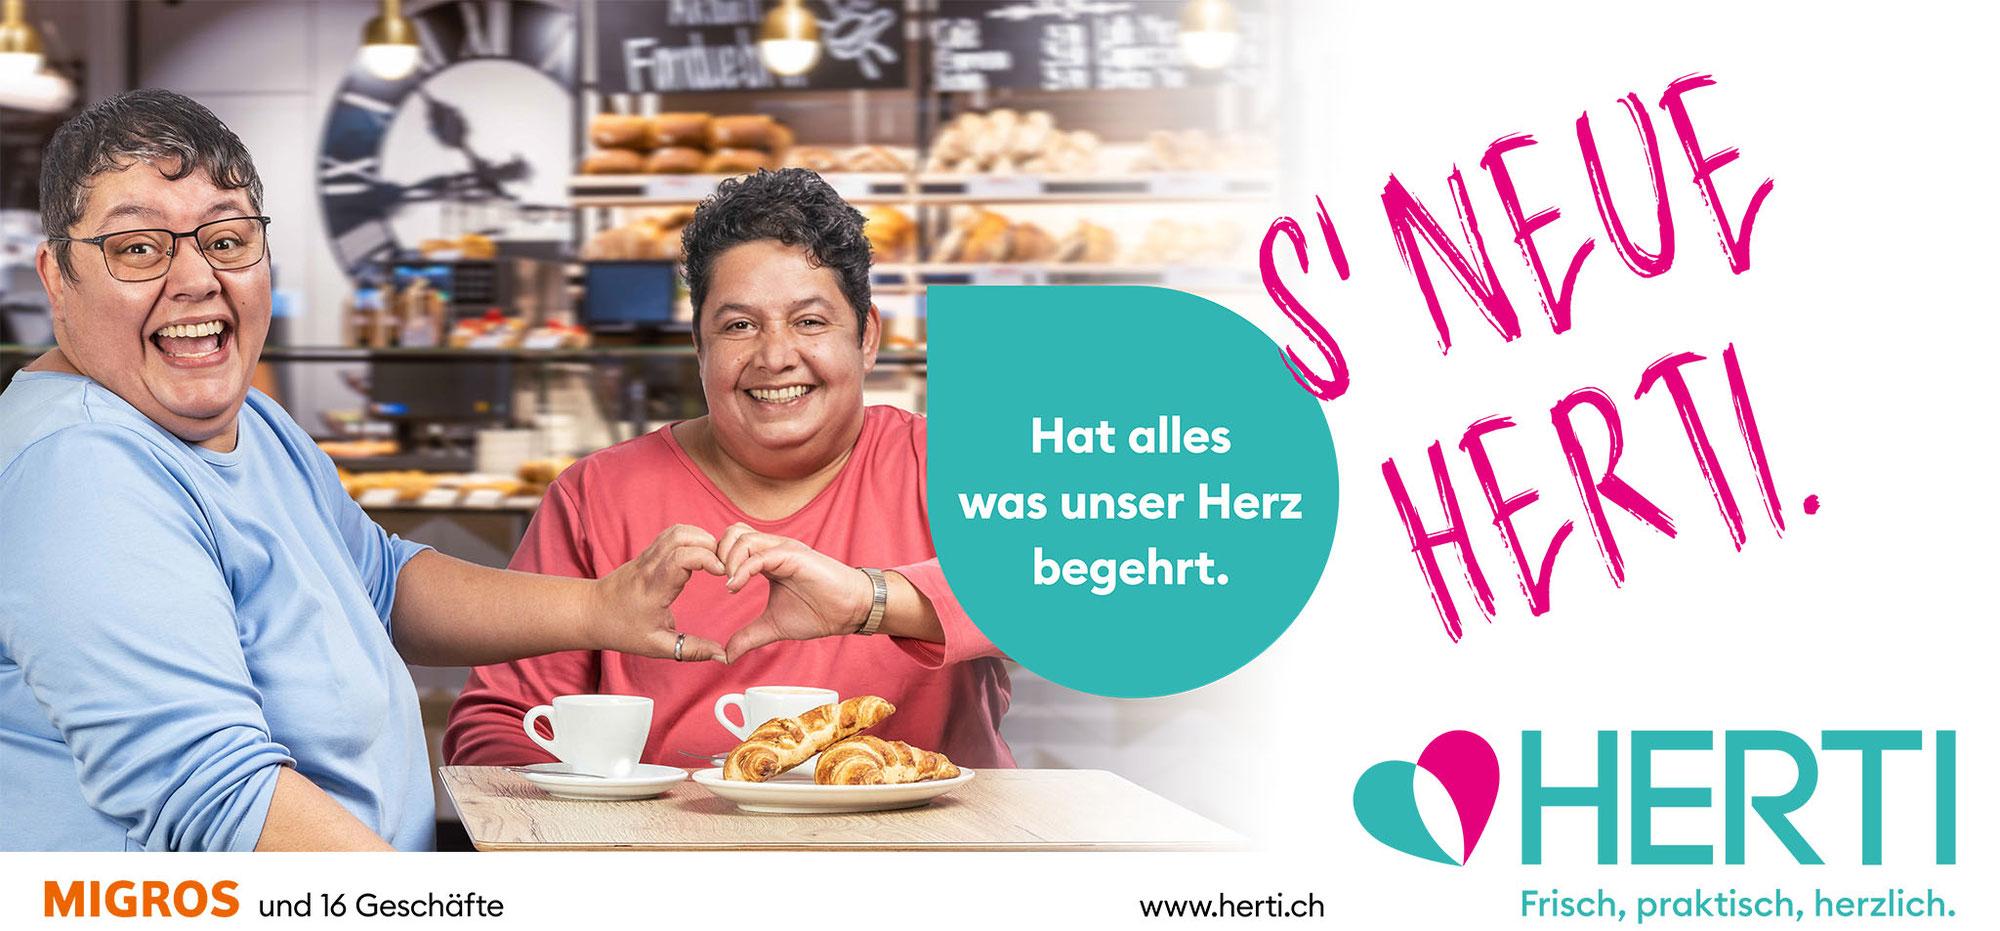 FollowUp-Kampagne Herti-Zentrum